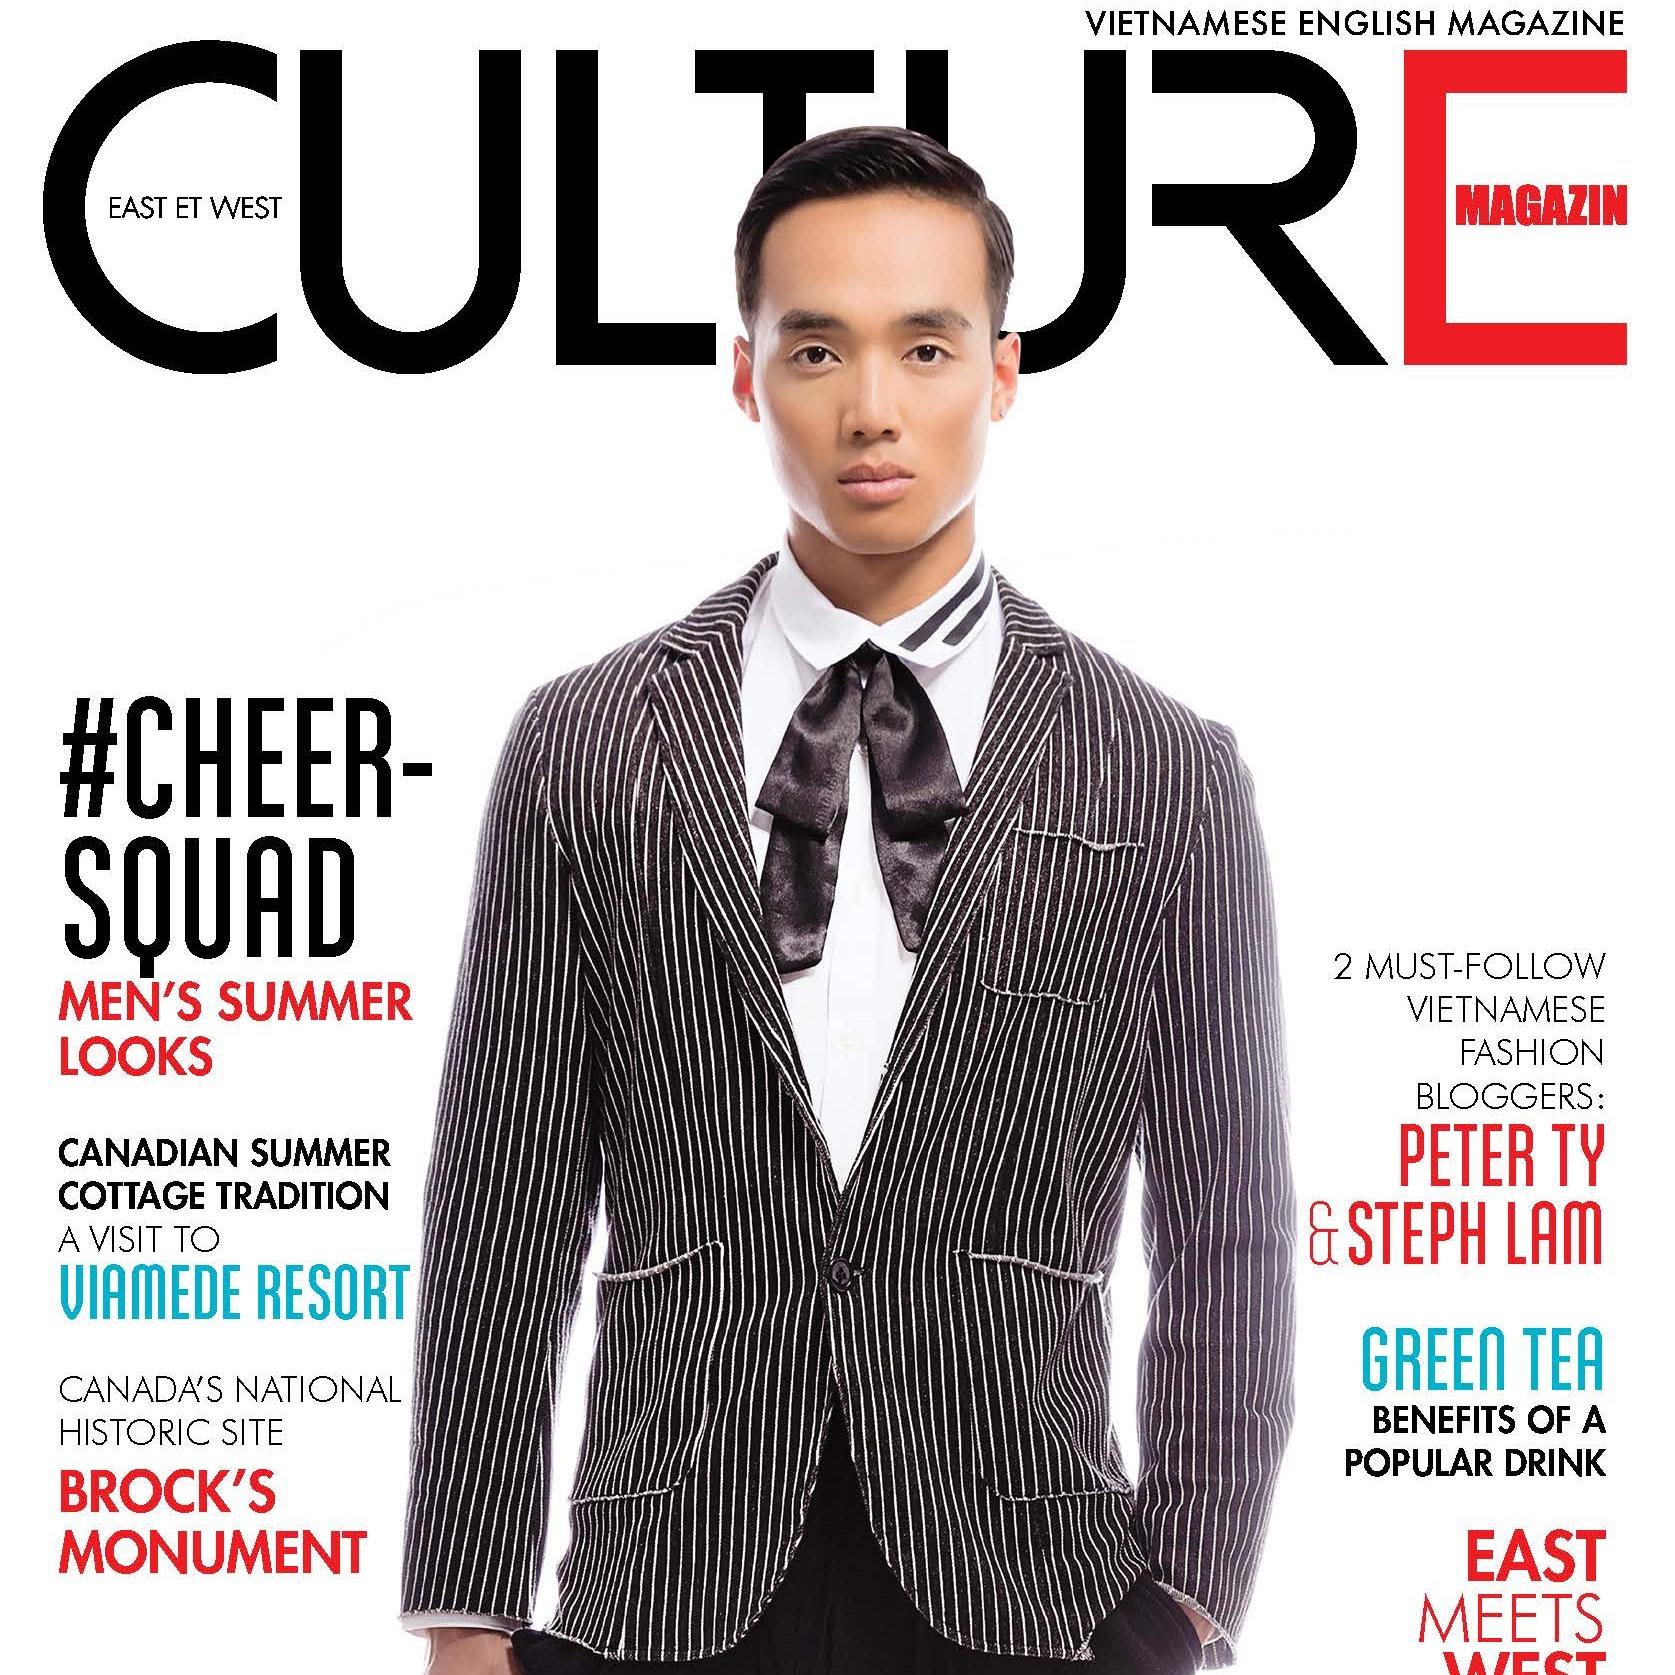 CULTURE MAGAZINE-JUL 2016 ISSUE-COVER AND SPREAD